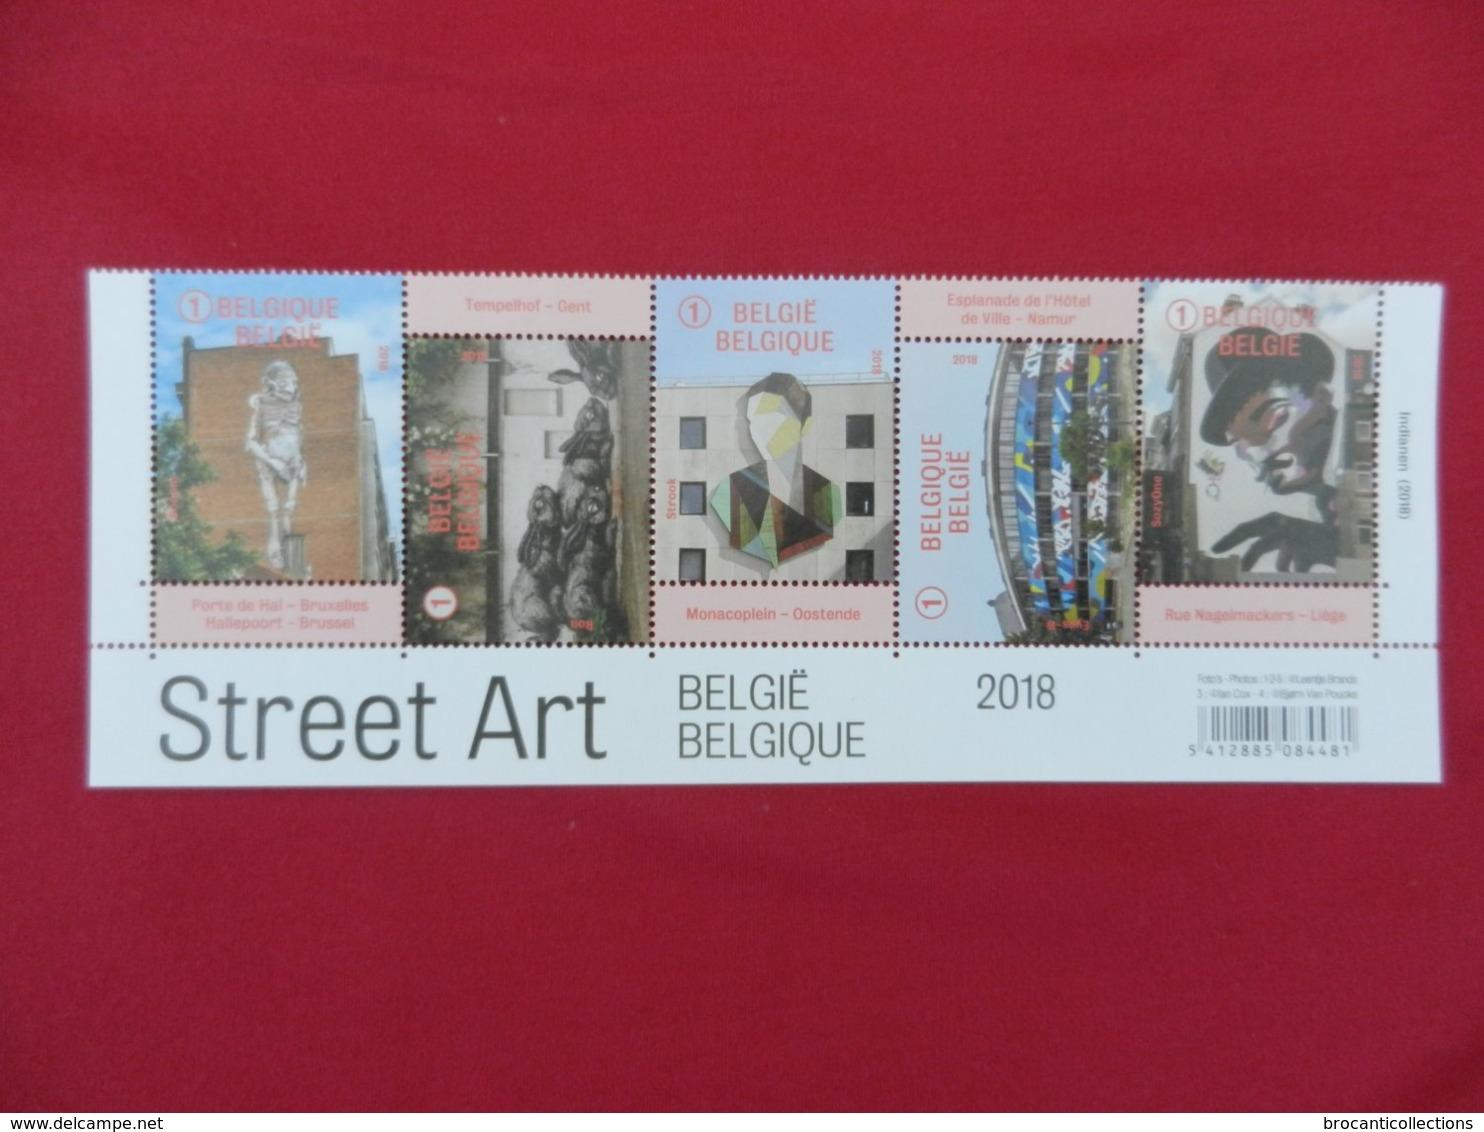 Planche De Timbres Neufs Belgique - Street Art - 2018 - Feuillets